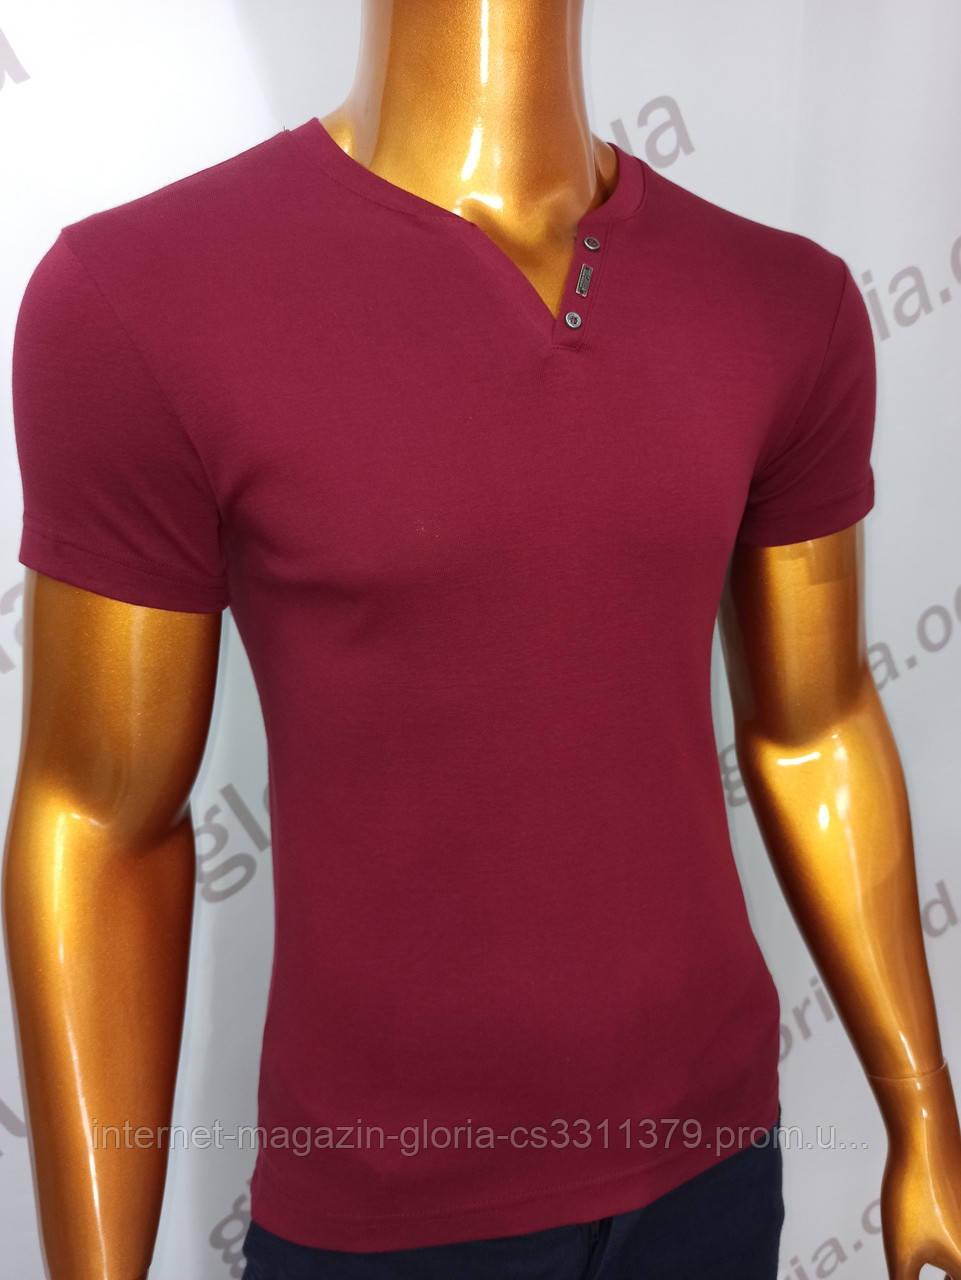 Мужская футболка MSY. 23214-8161(b). Размеры: M,L,XL,XXL.